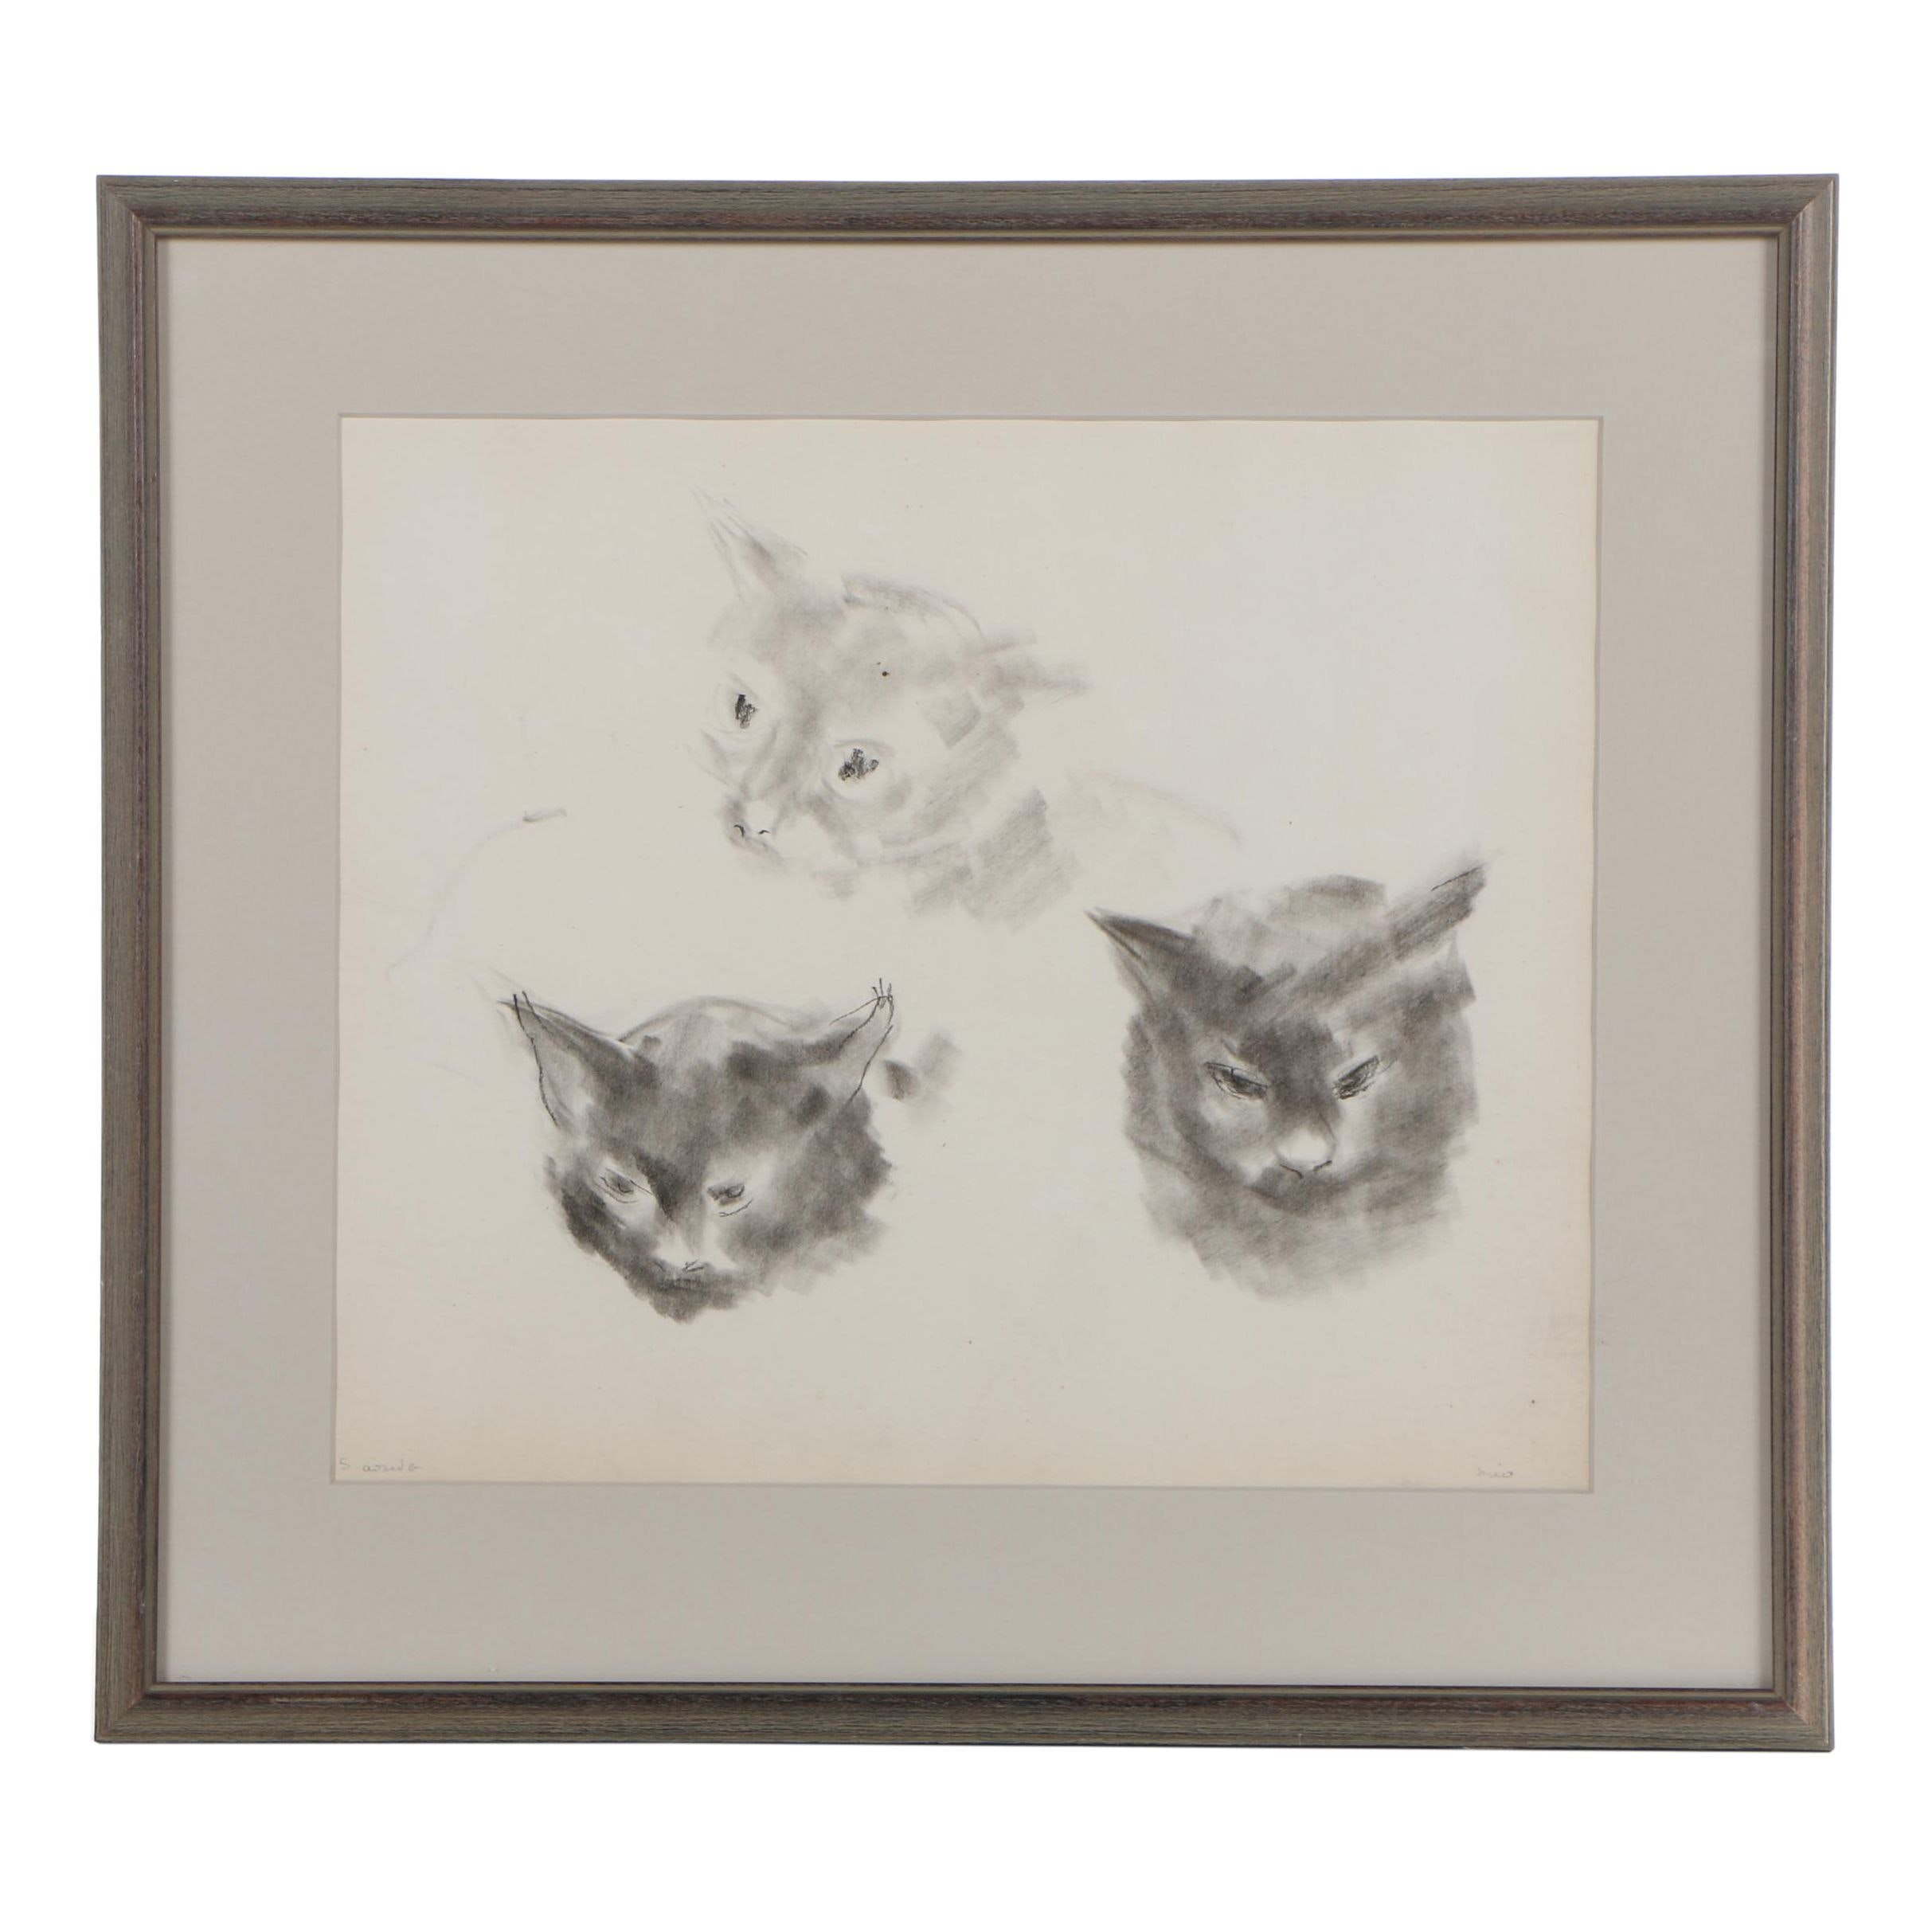 Feline Charcoal Drawings